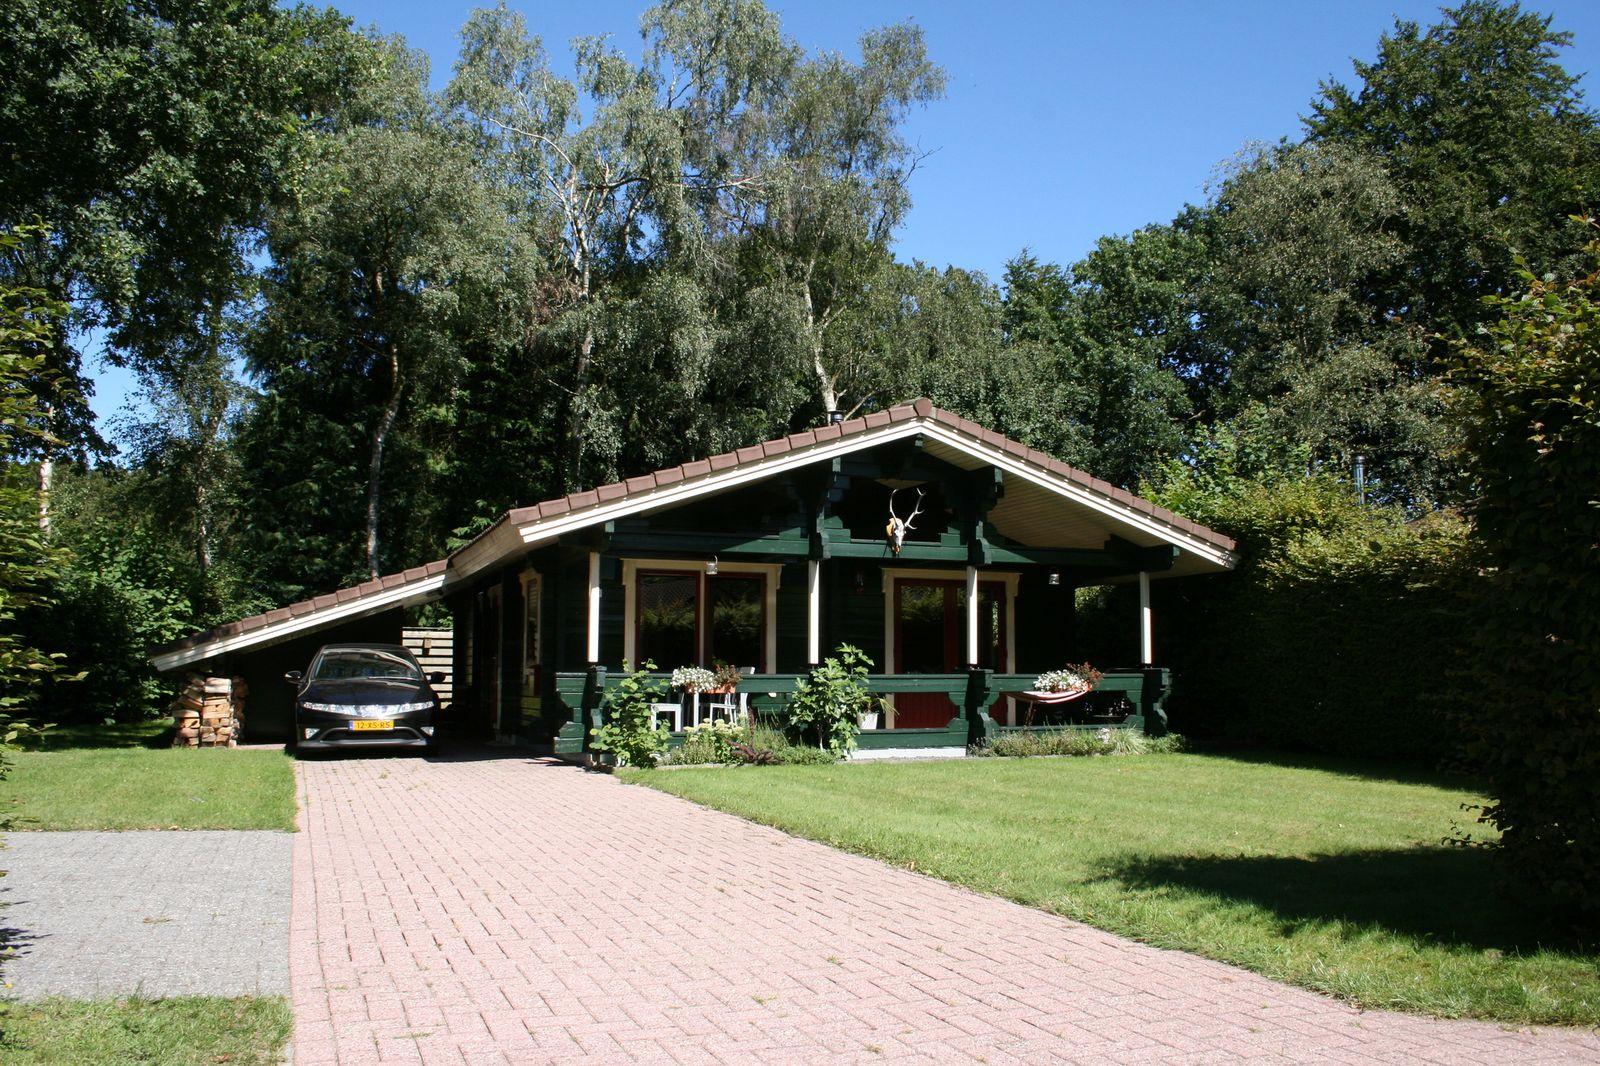 Harderwijkerweg 495-10, Hulshorst